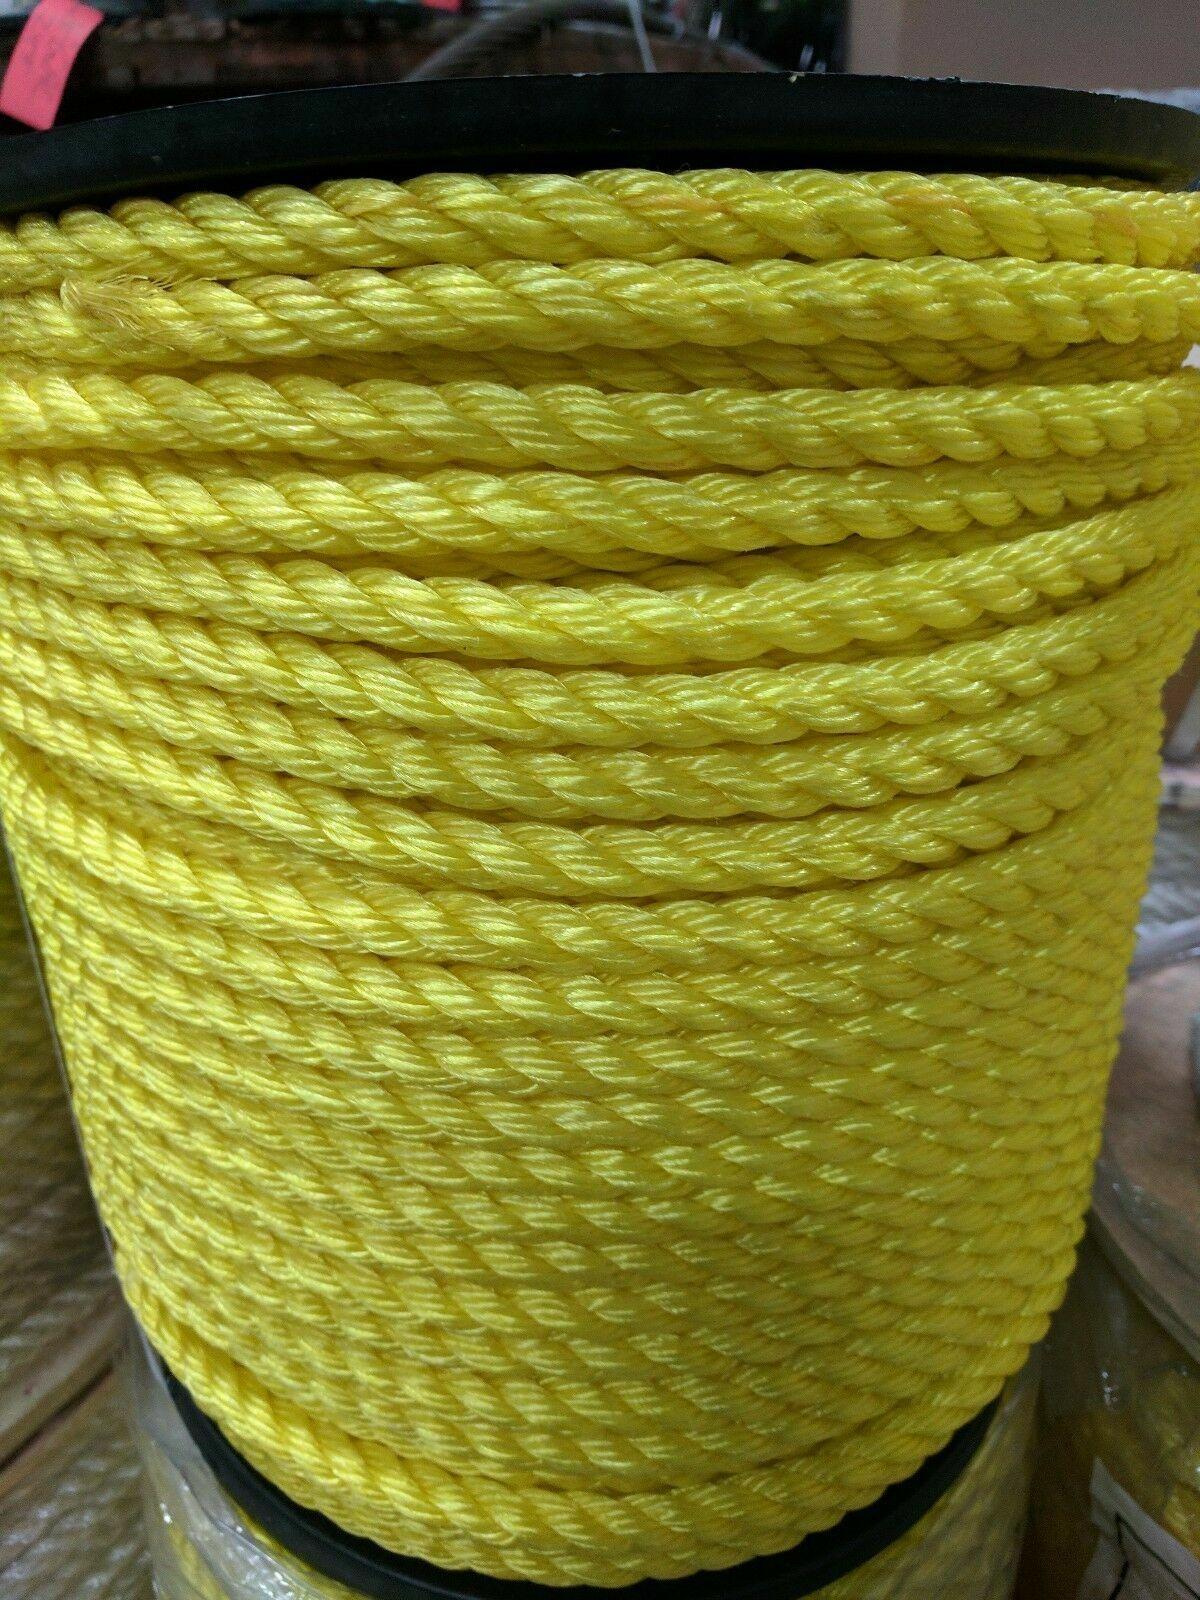 1 2  3-Strand Twisted Poly Pro Polypropylene Rope Yellow (1200 Feet)